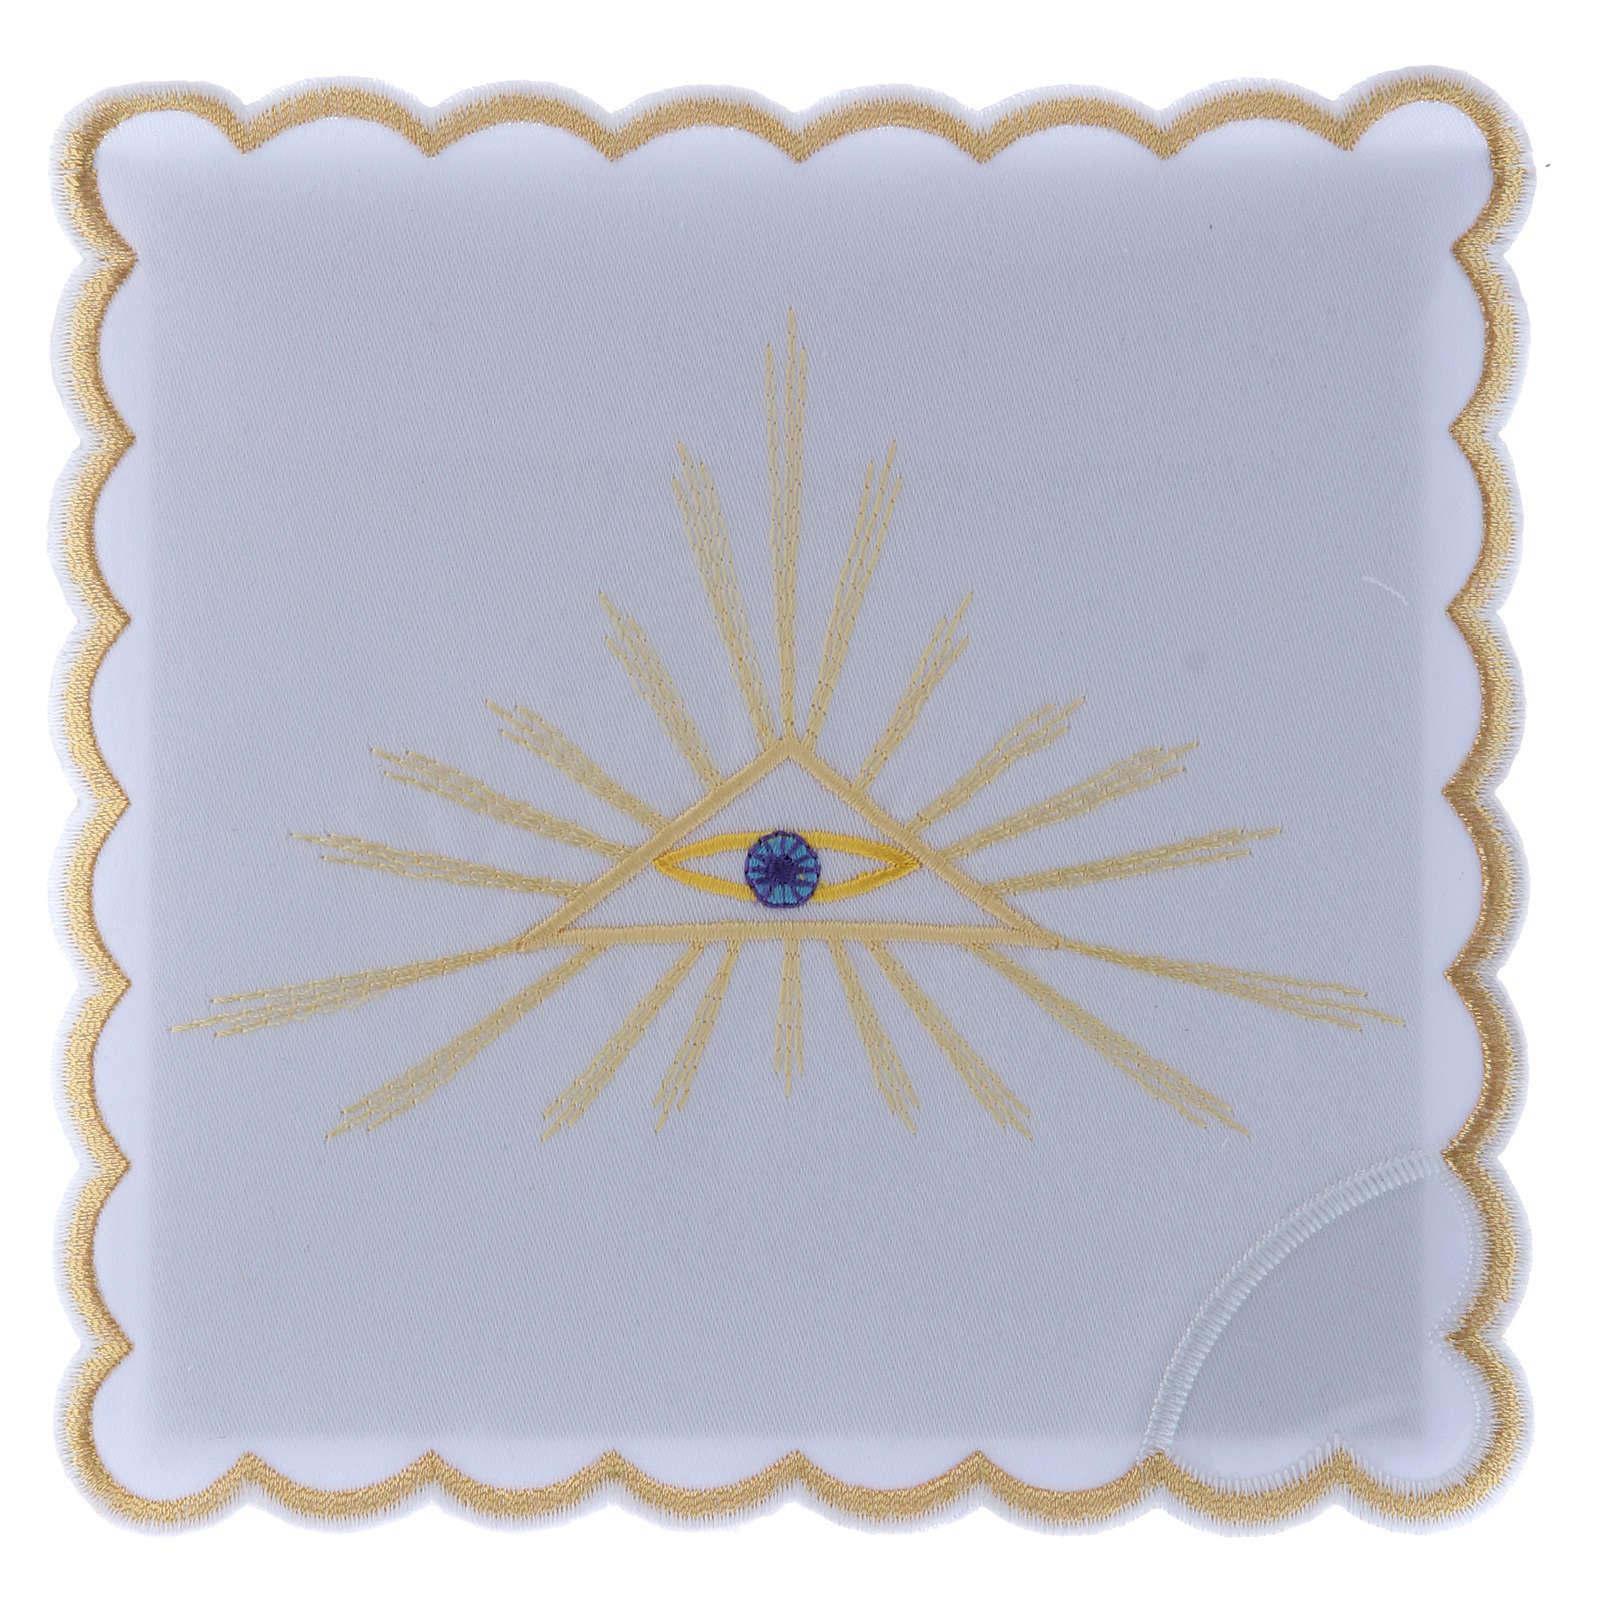 Altar linen set golden rays and Eye of God, cotton 4